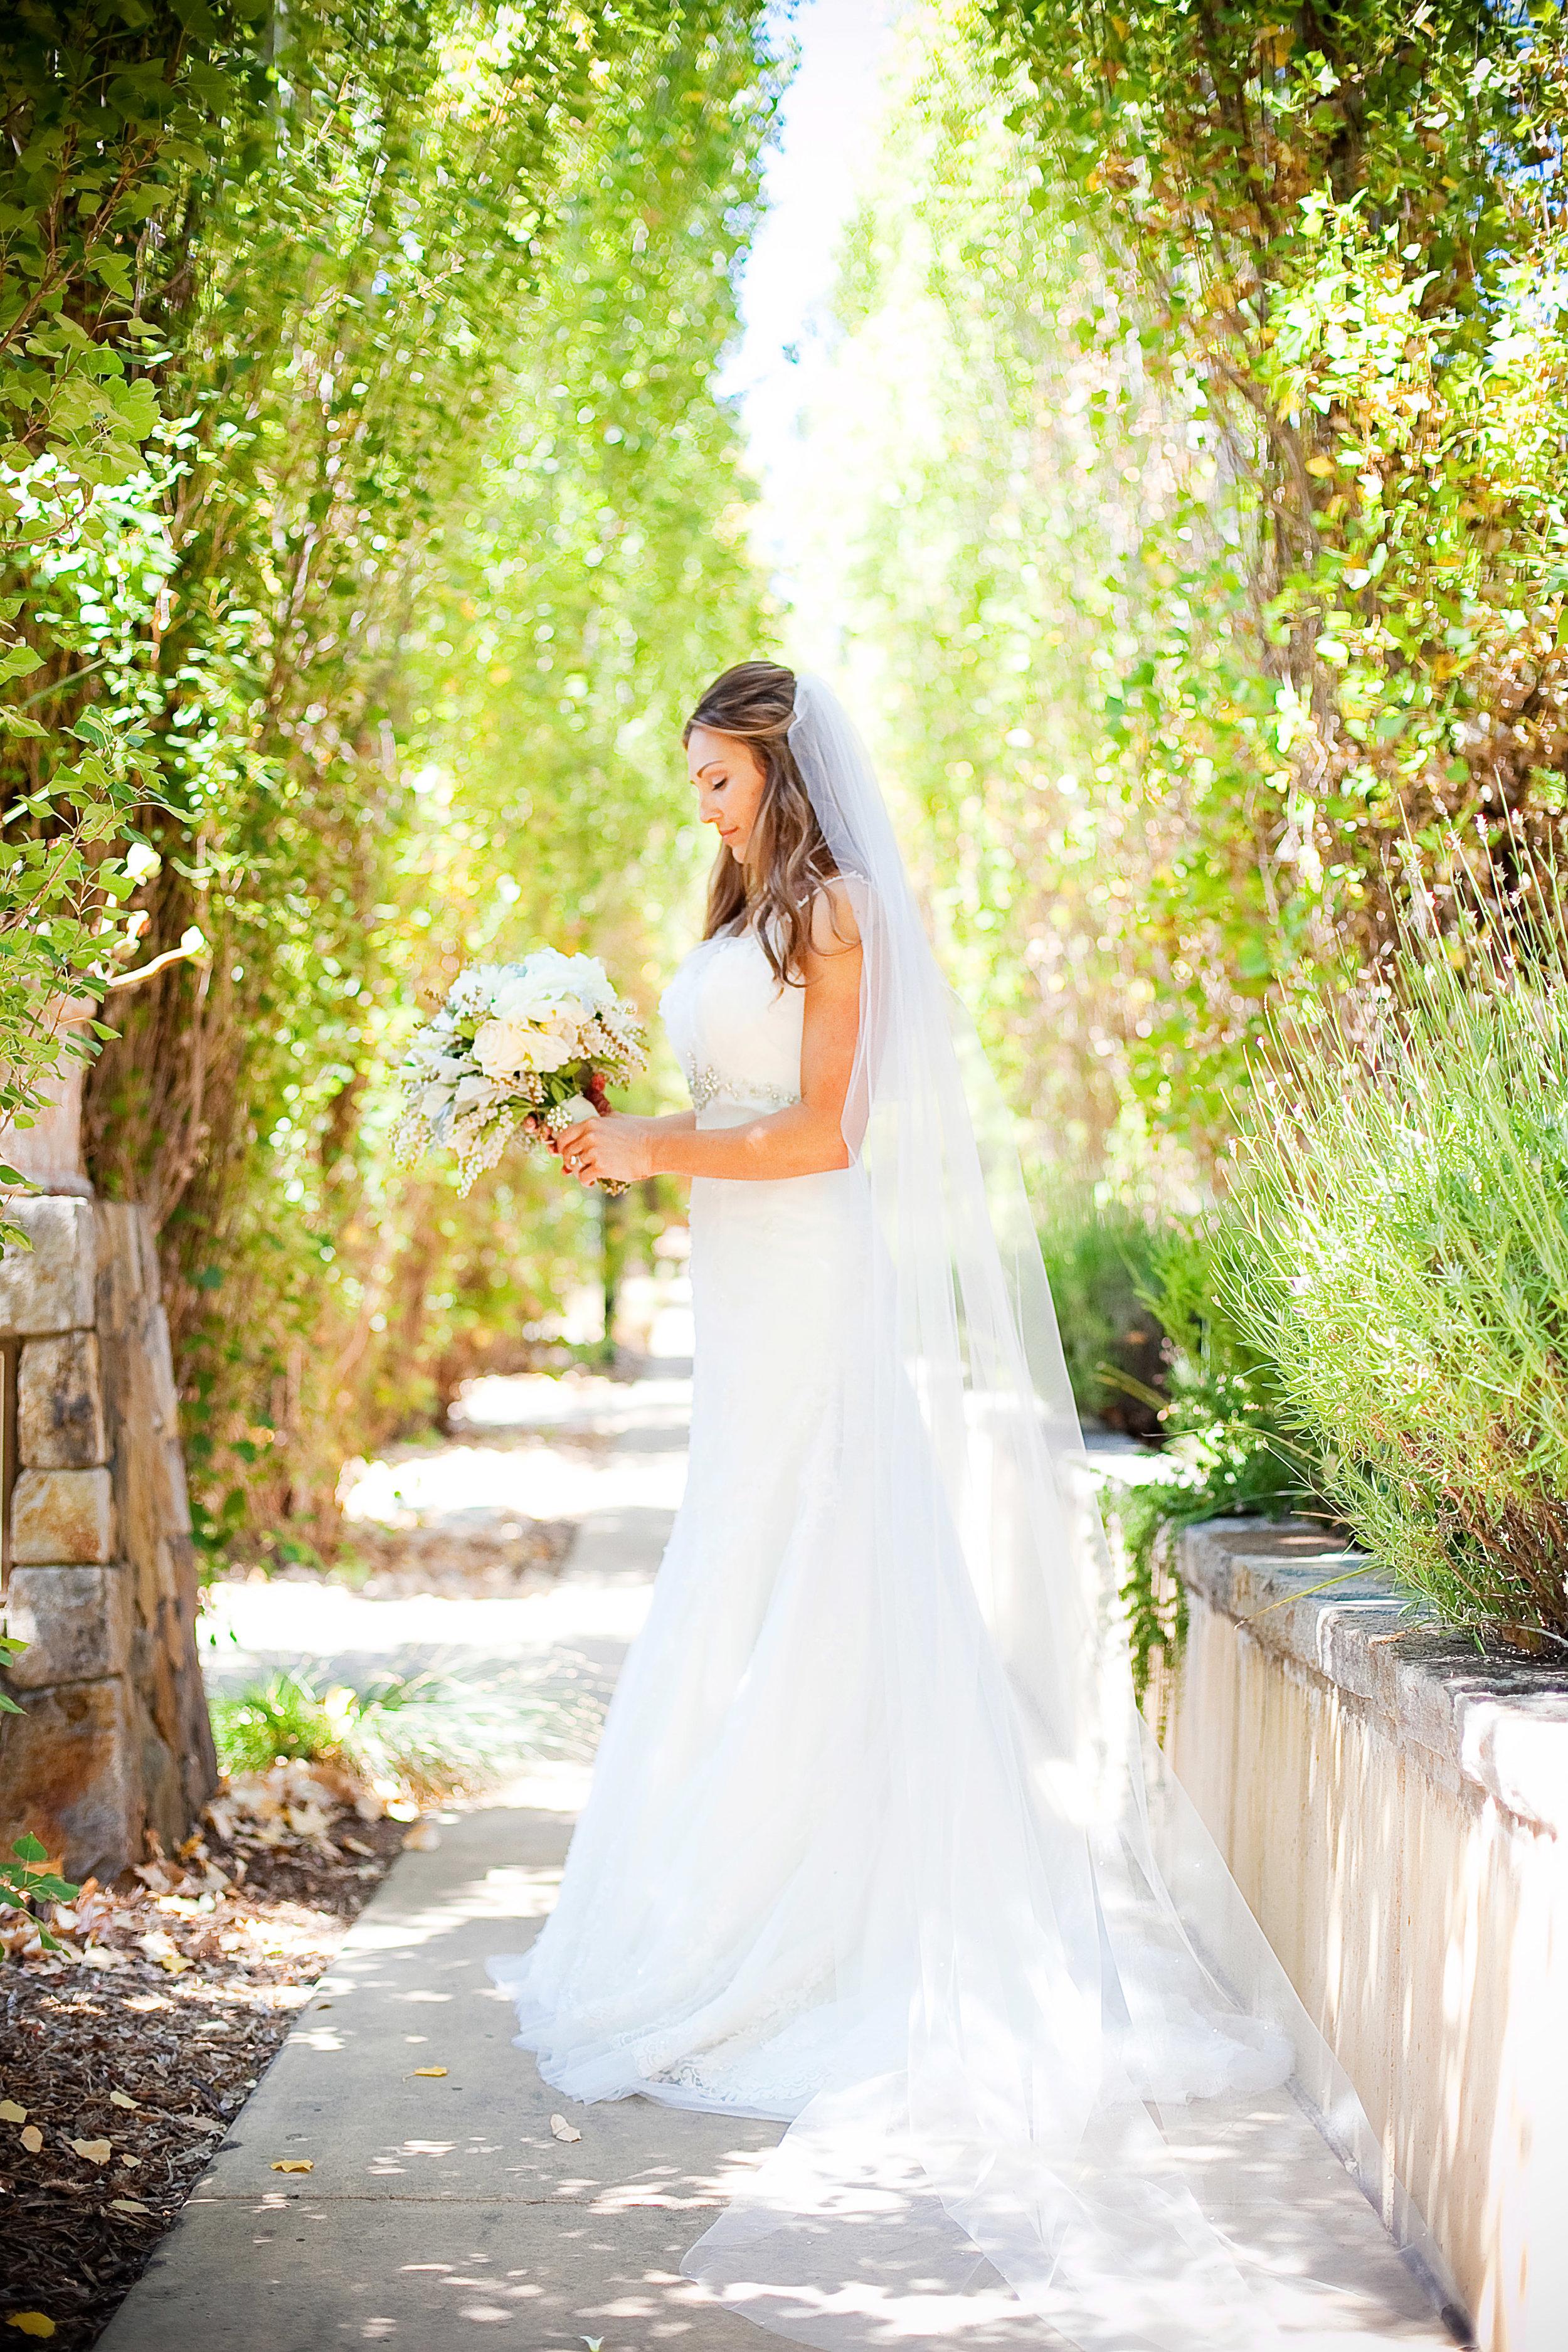 Best-Napa-Valley-Wedding-Venues-Calistoga-Ranch-(7).jpg